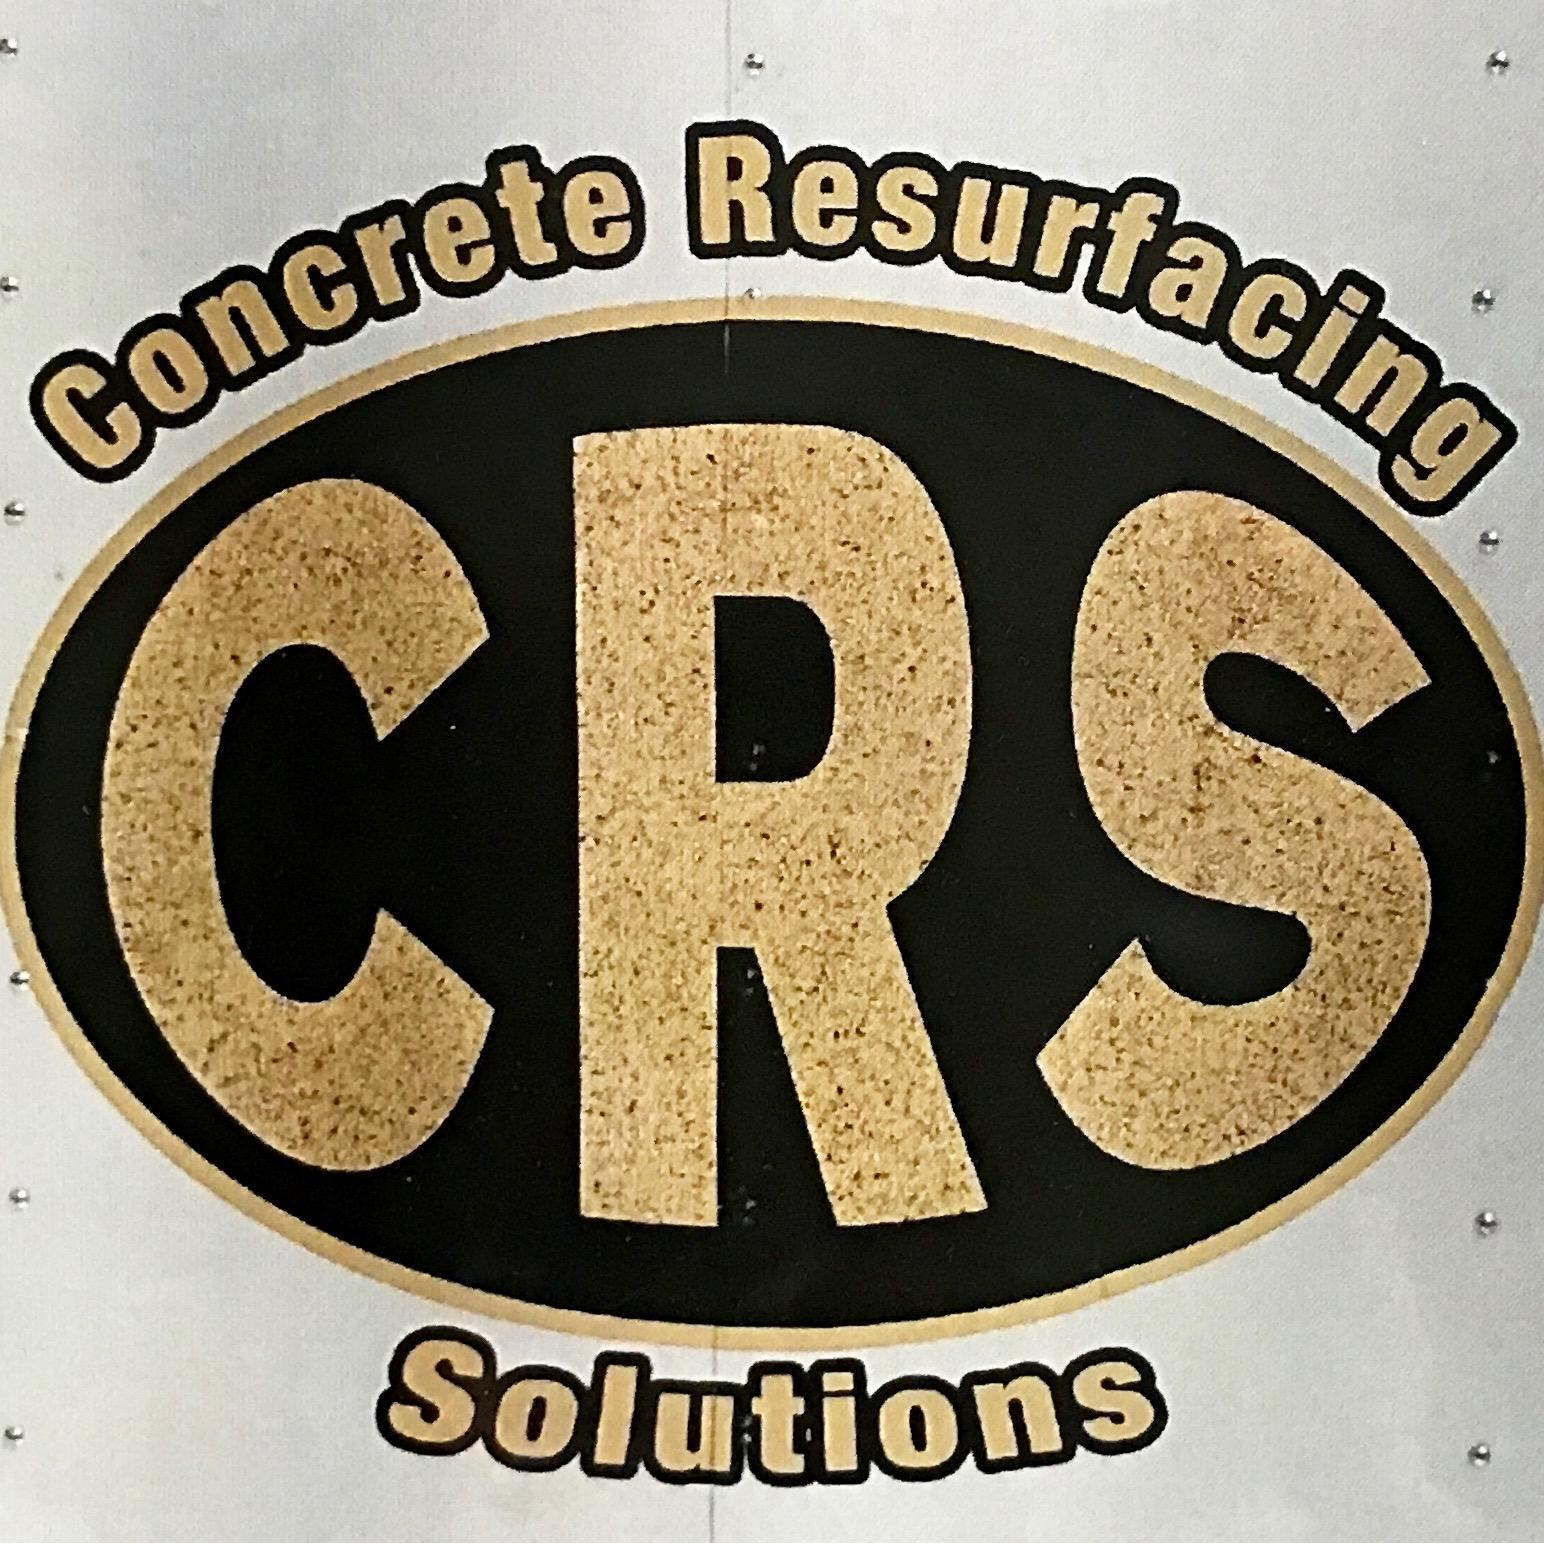 Concrete Resurfacing Solutions